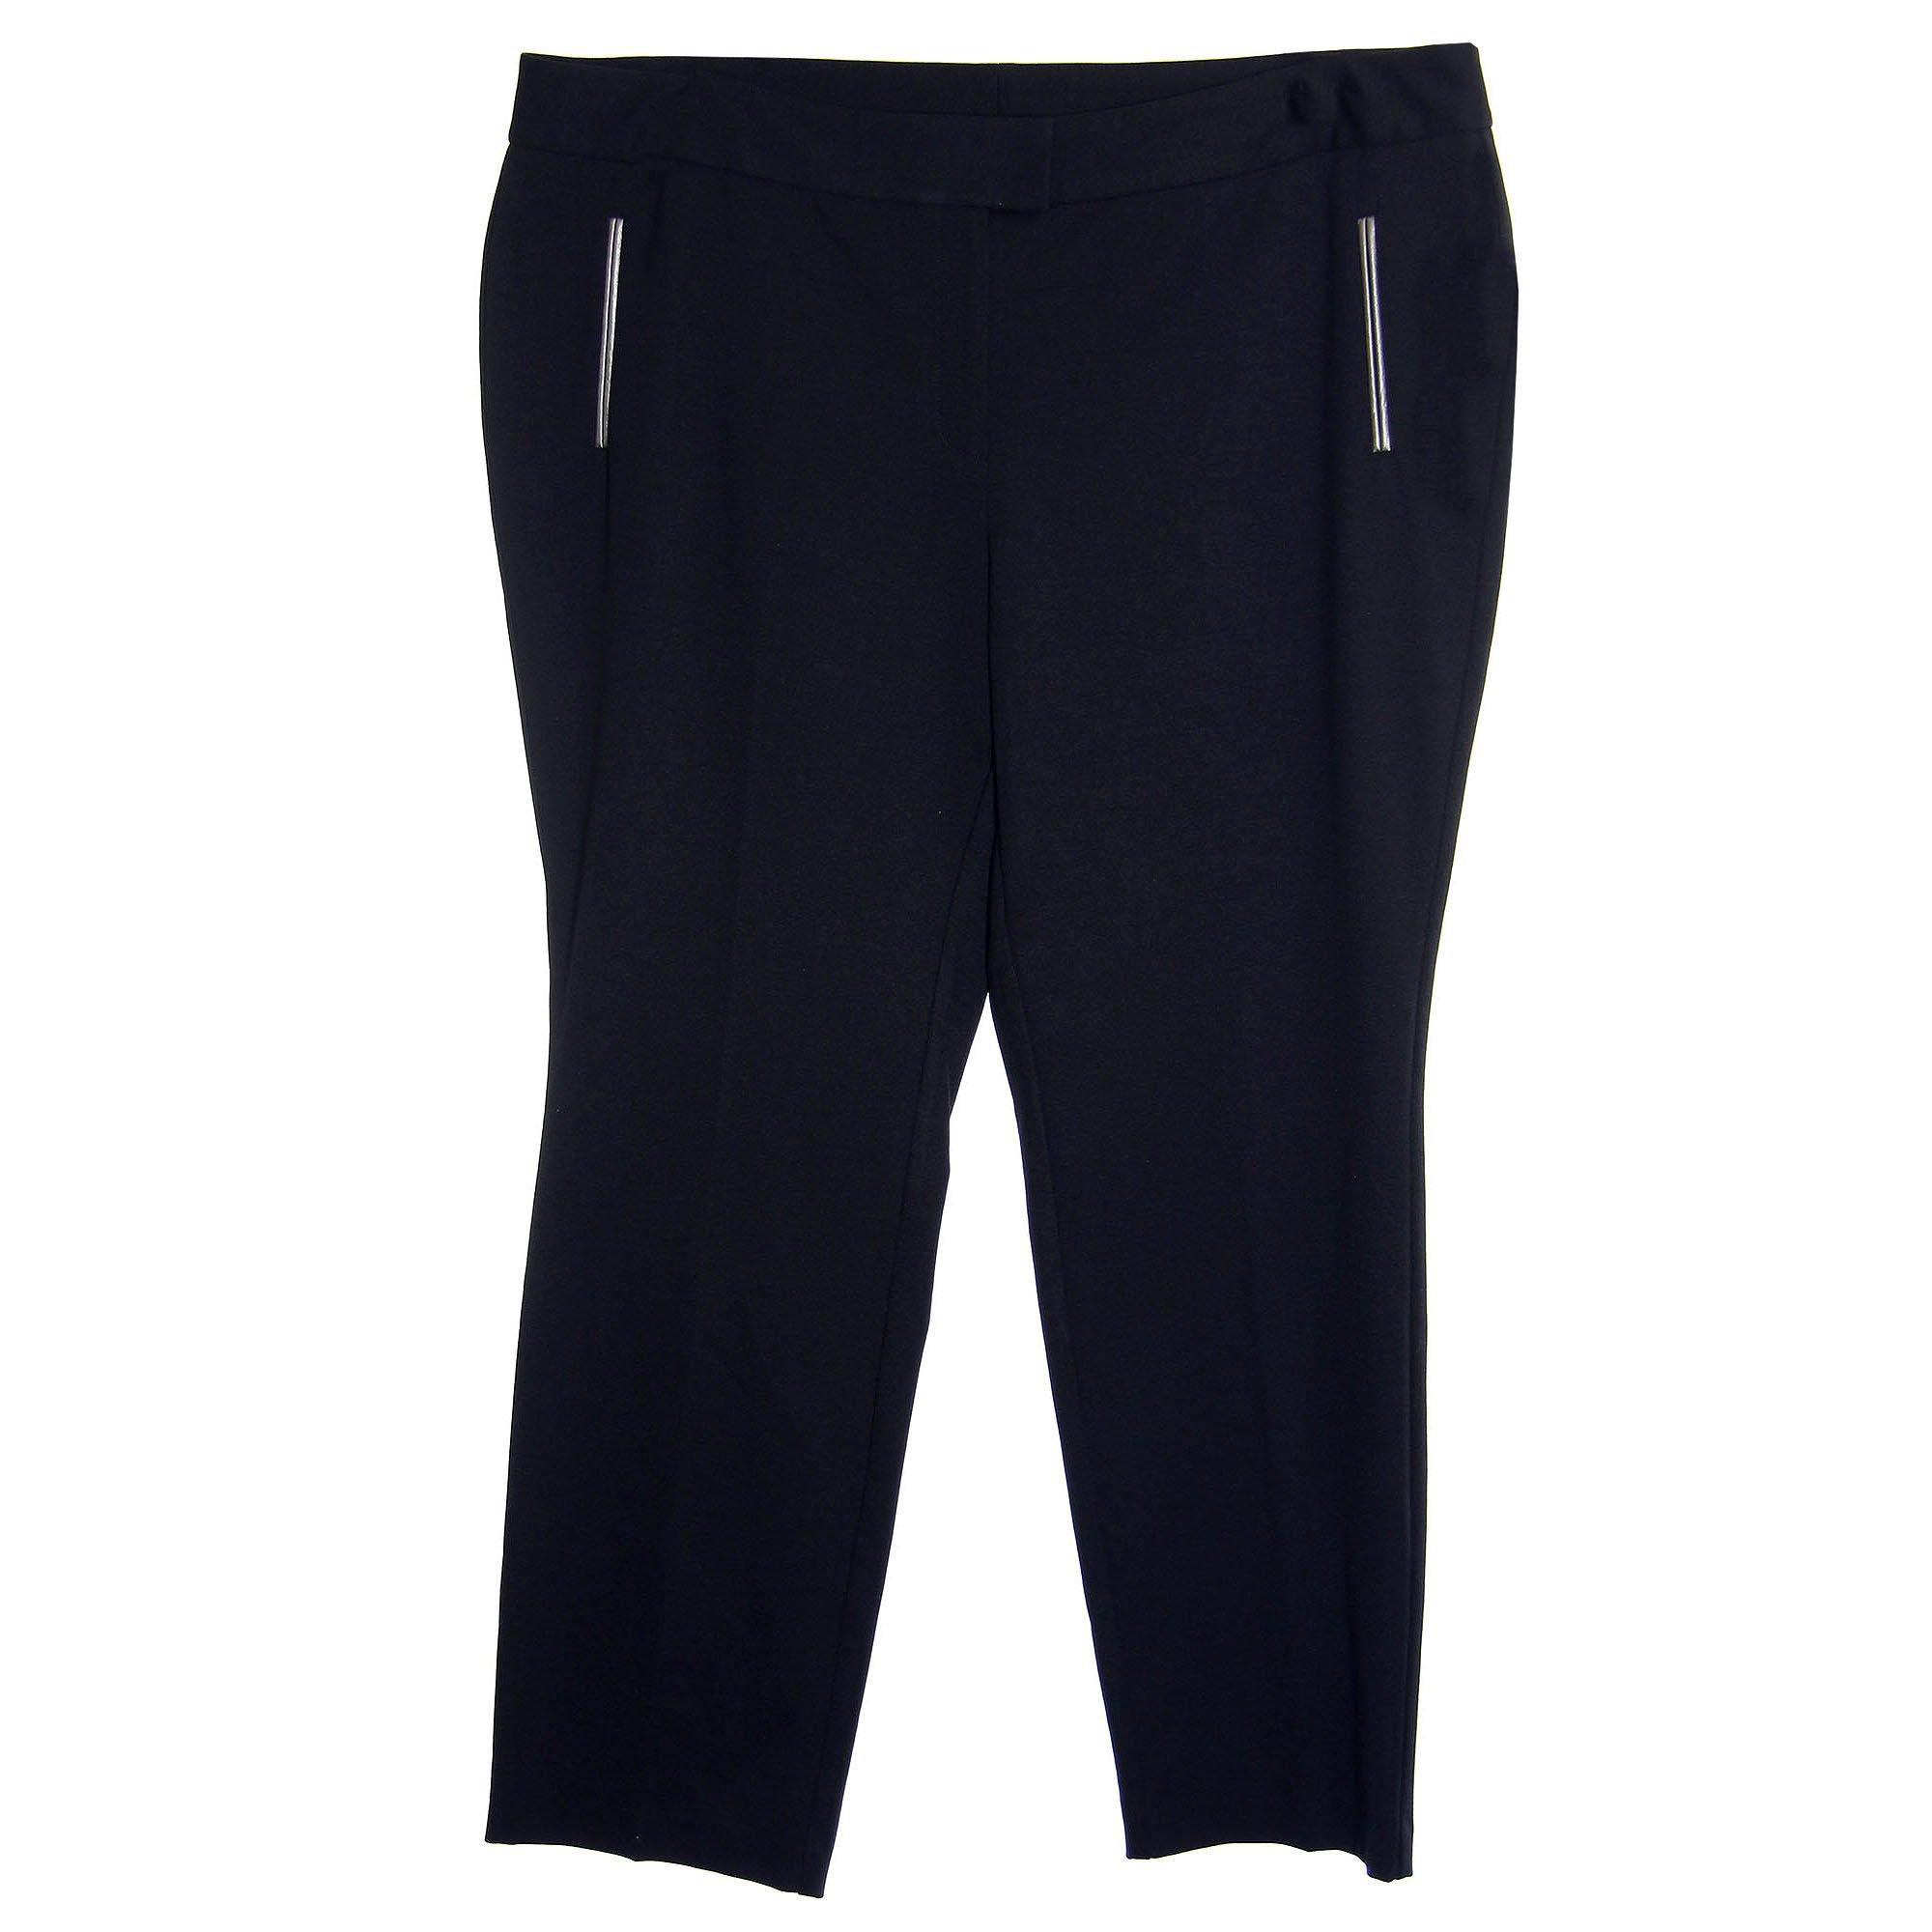 Alfani Women's Plus Size Tummy Control Slim Leg Faux Leather Trim Pants 24w Black